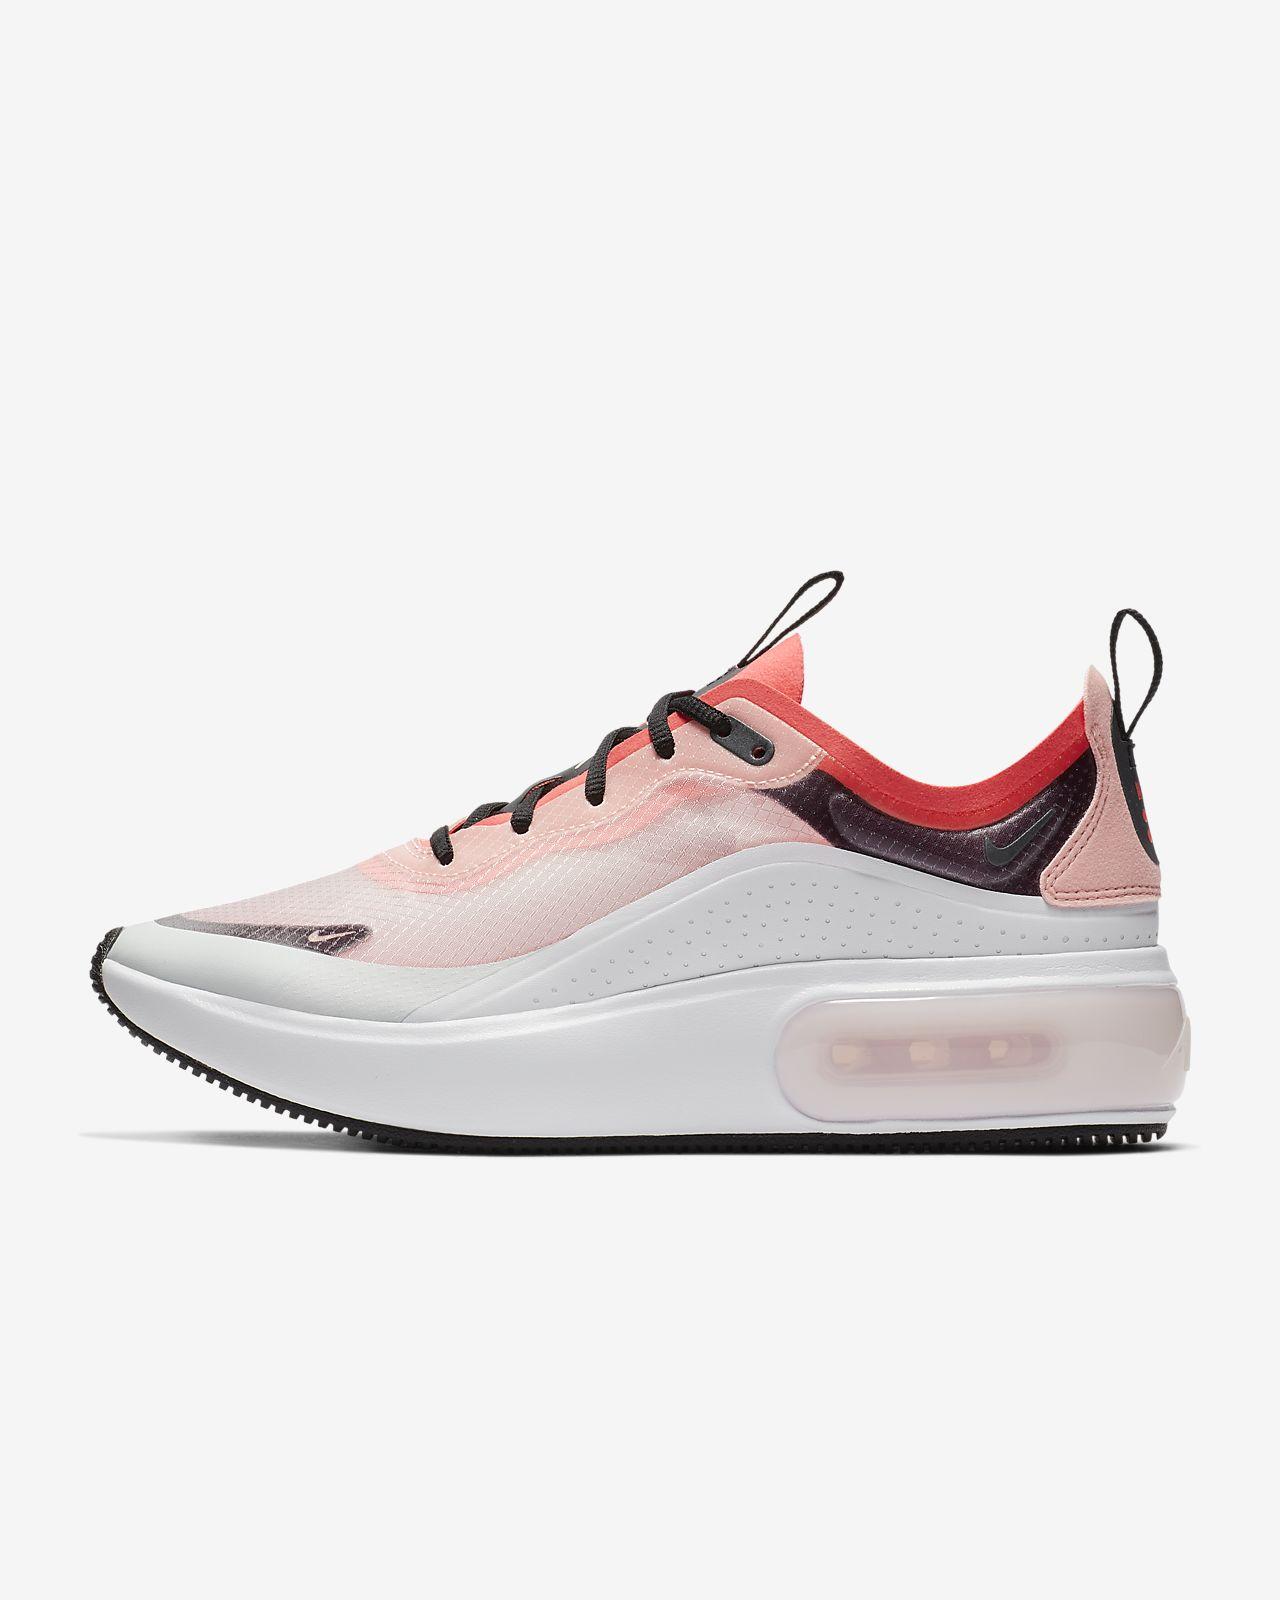 new arrival 7e6f5 b831e Nike Air Max Dia SE QS damesko